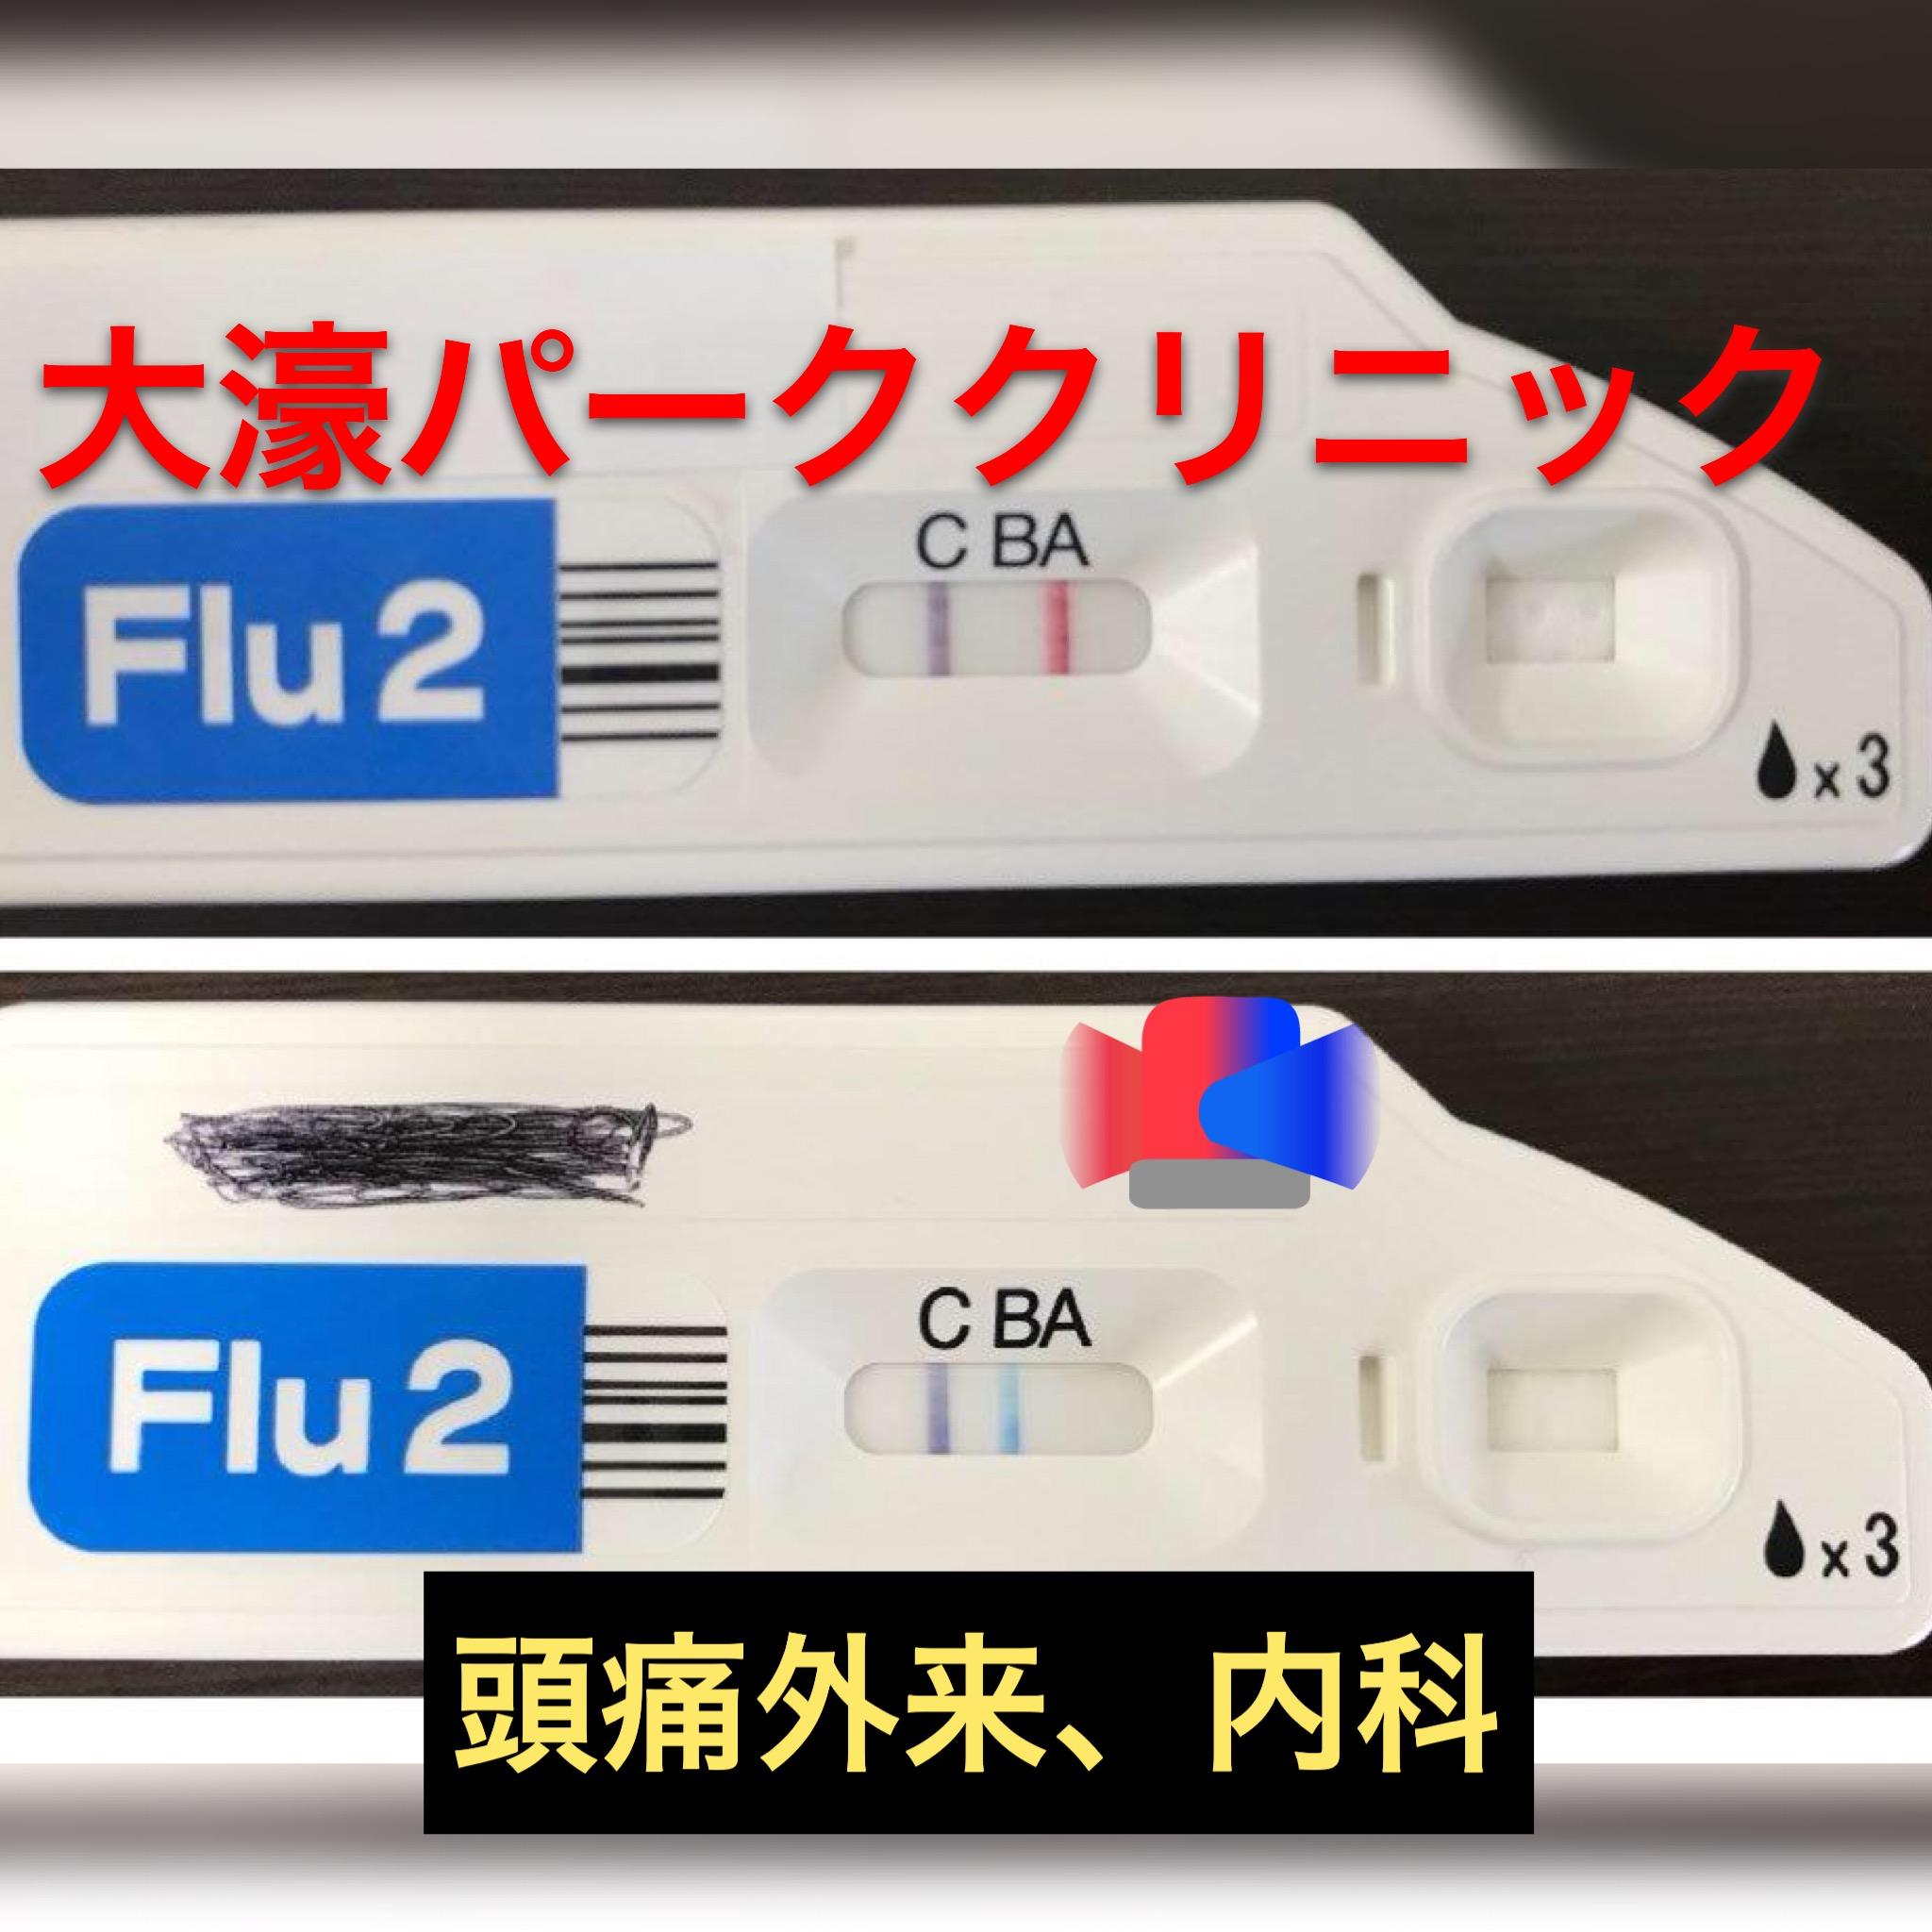 4DFCF107-005C-4C9A-B139-518455F5F9CC